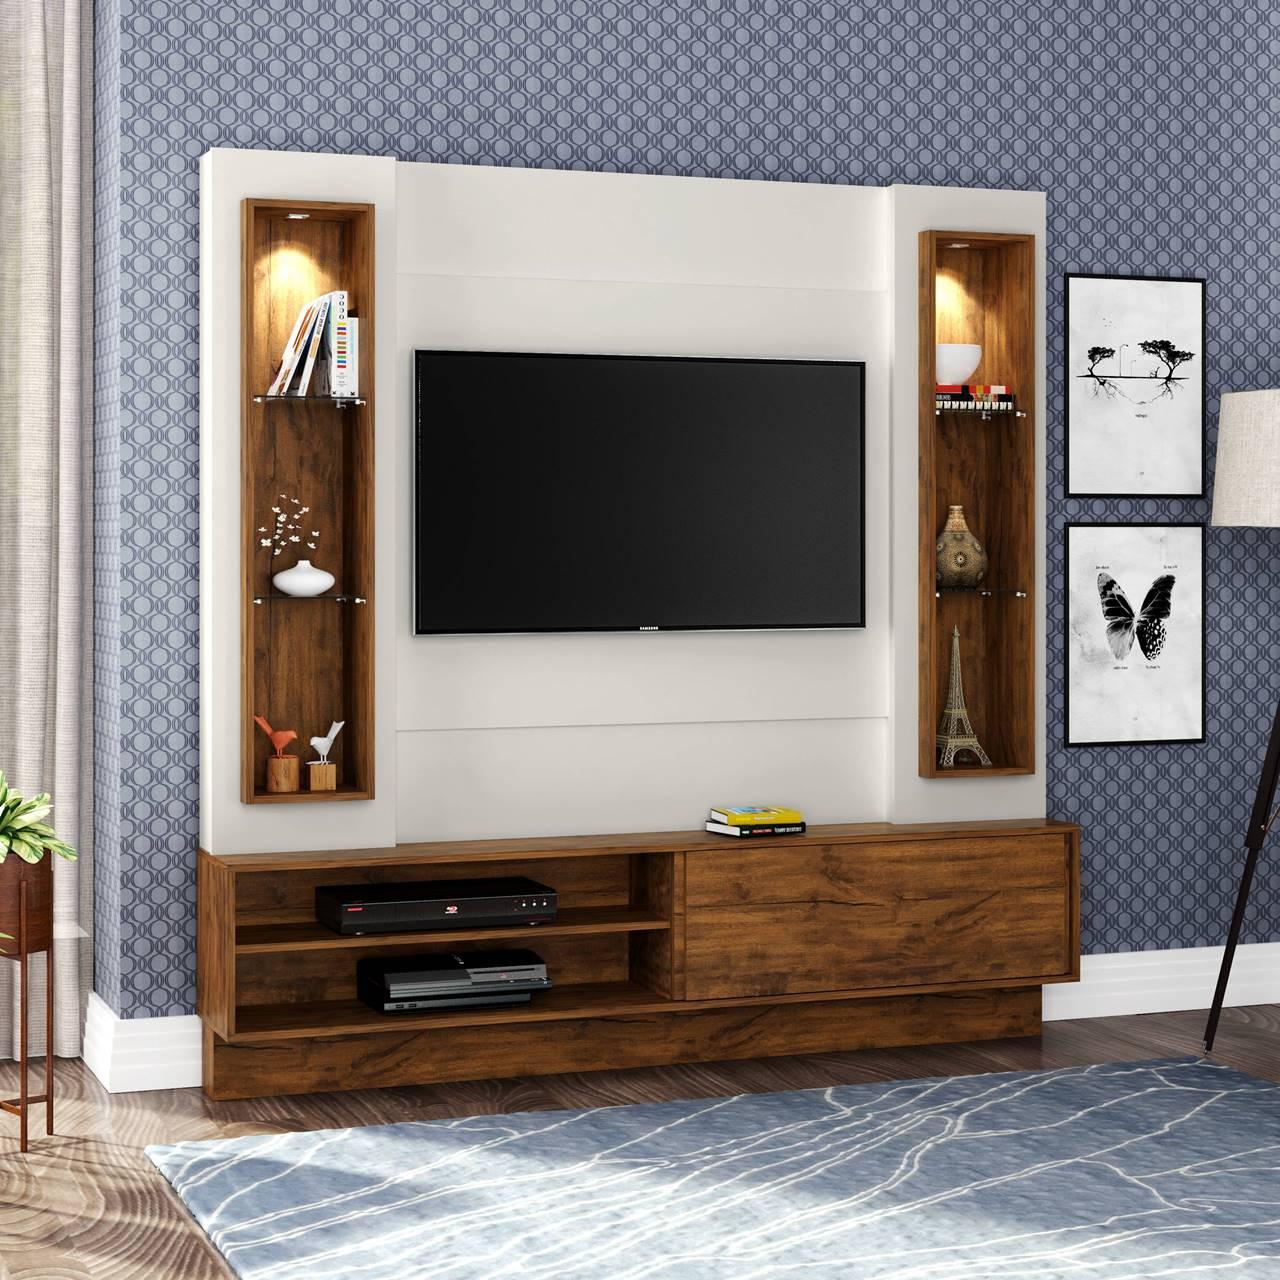 "Painel Home Suspenso p/ TV até 32"" com LED TB128L Dalla Costa Offwhite/Nobre"